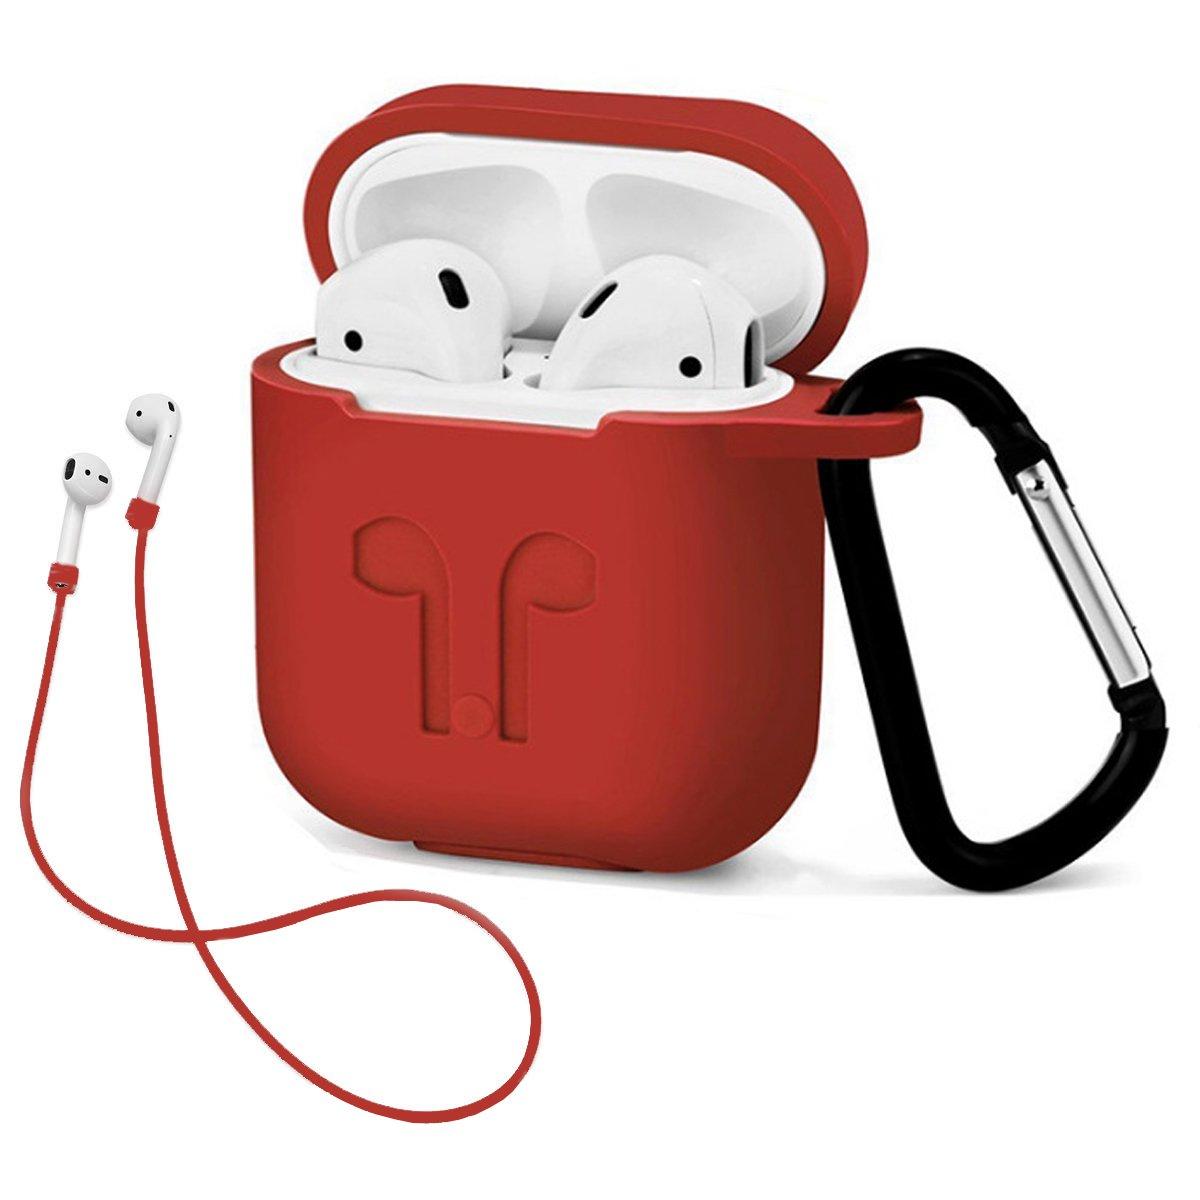 Amazon.com: Funda para Airpod con llavero, silicona a prueba ...